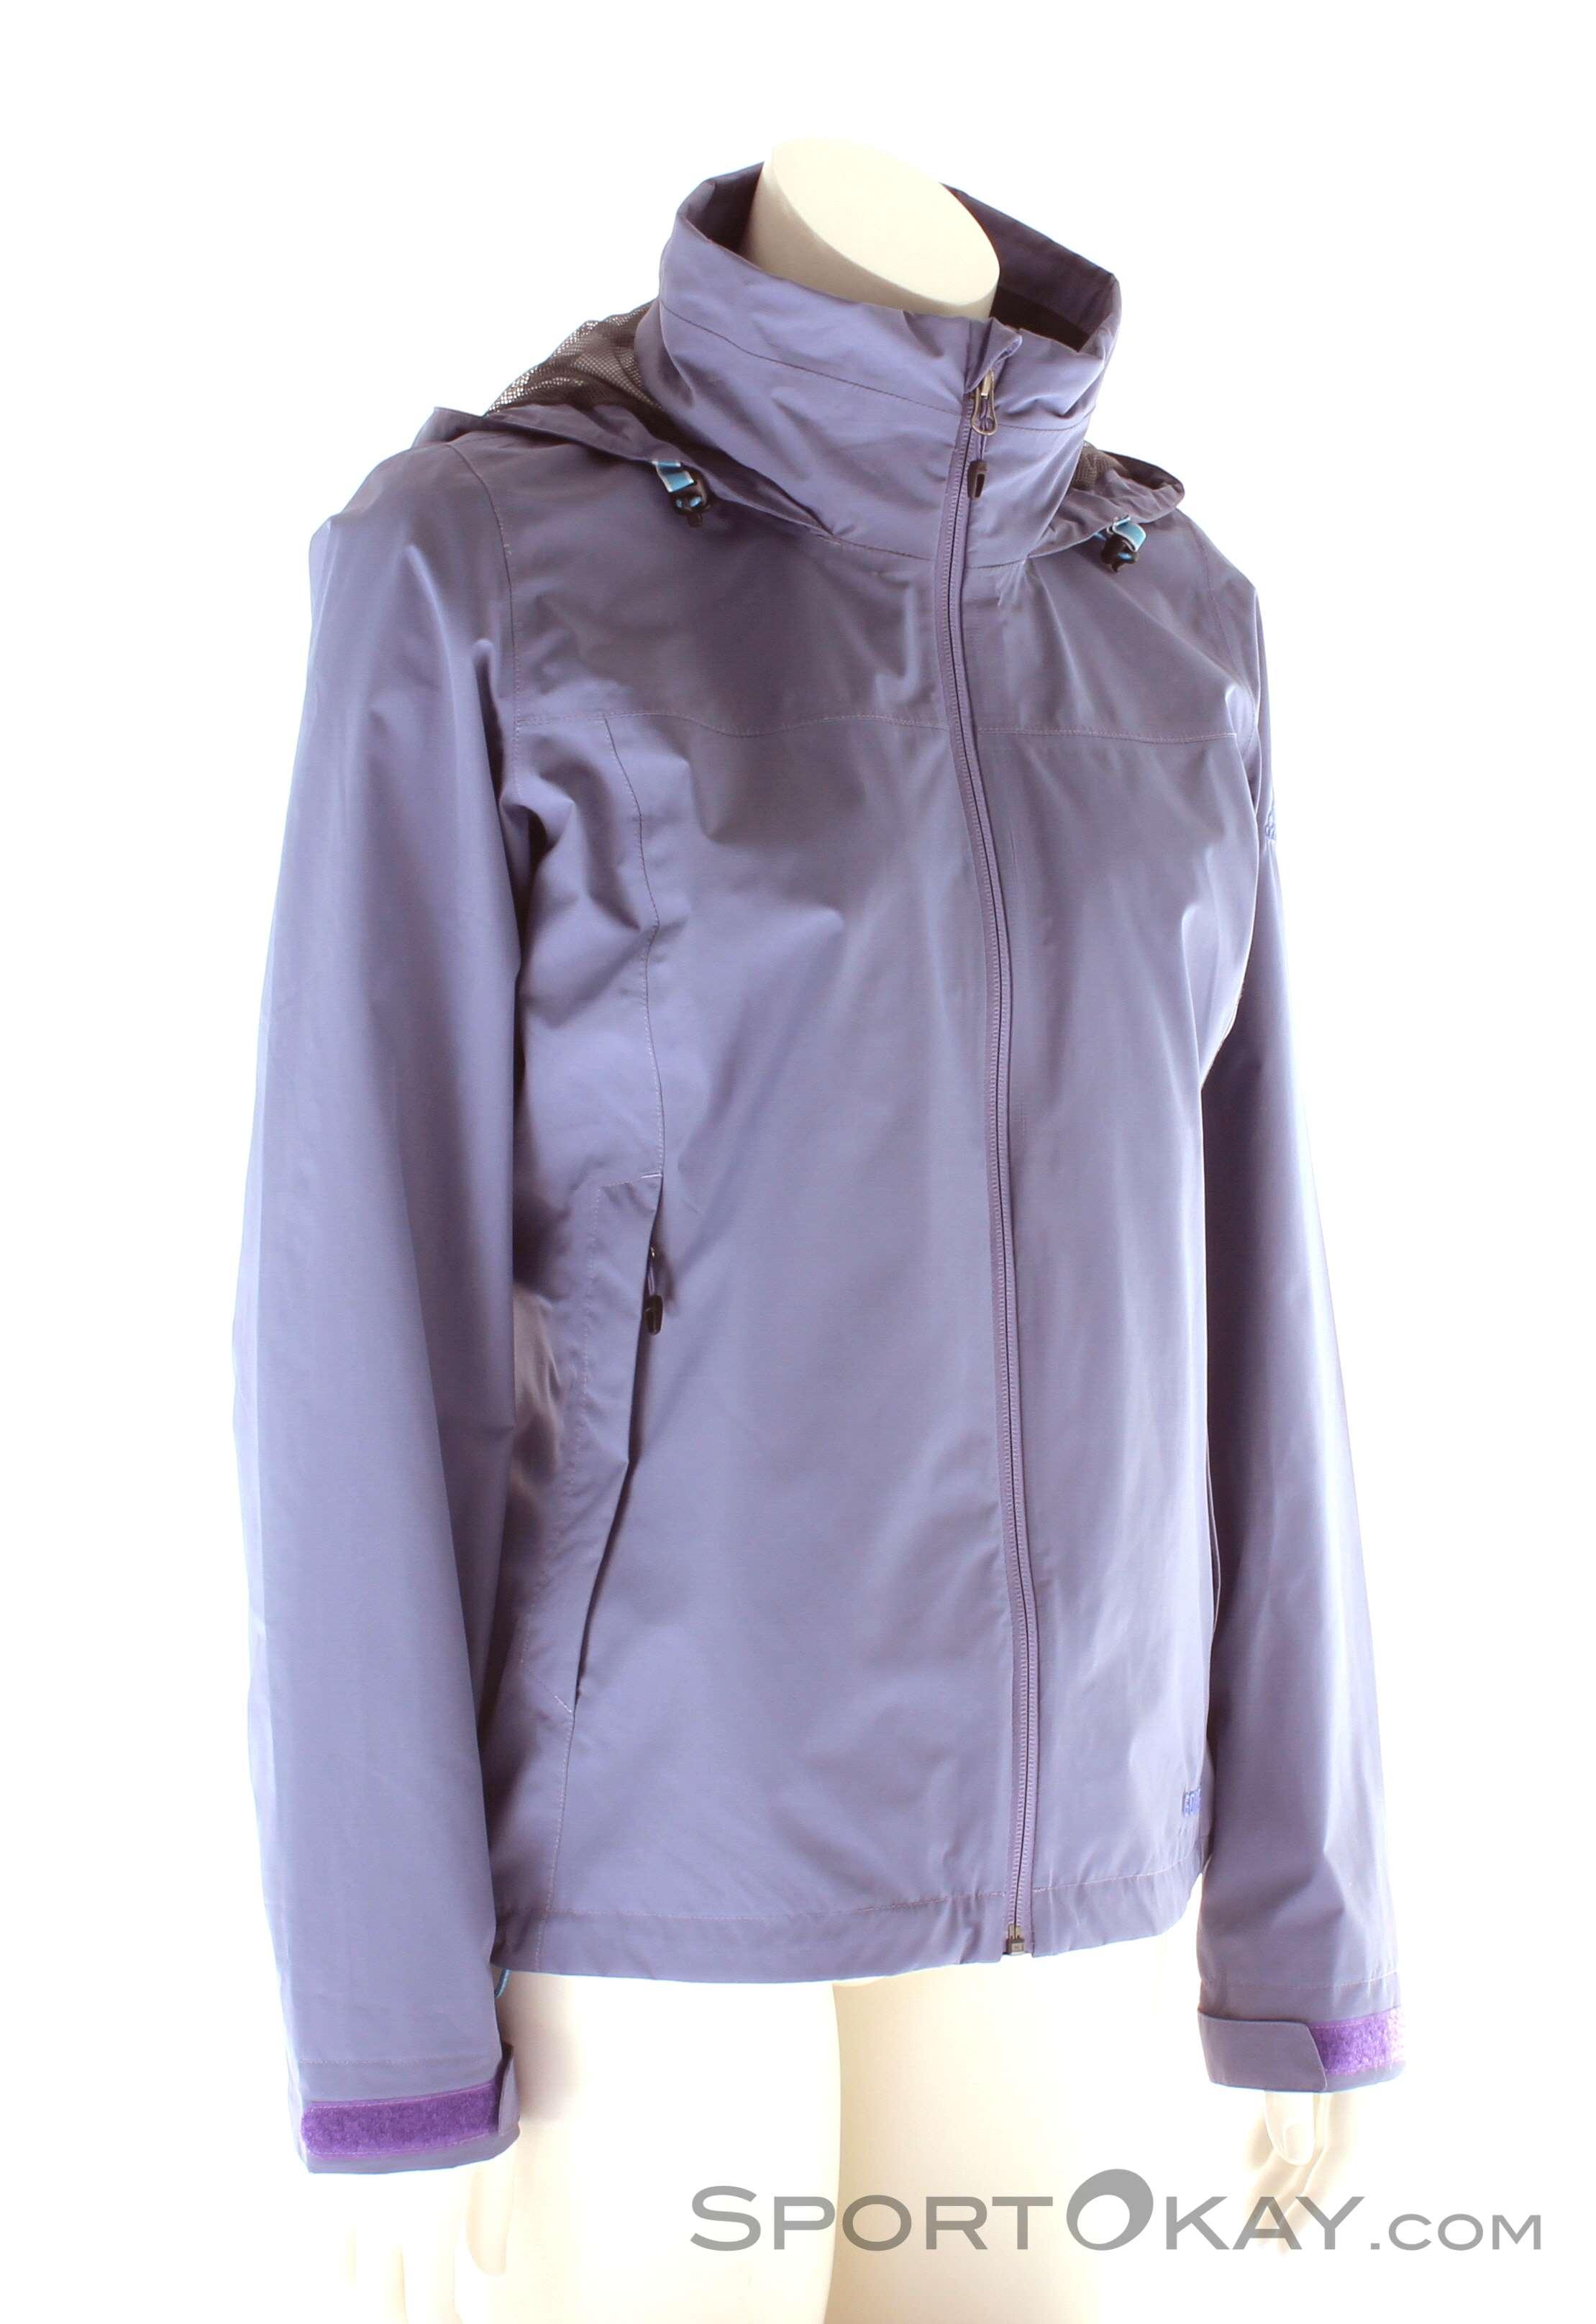 Jacket Outdoor Giacca Giacche Gore Gtx Donna Wandertag Adidas Tex wXqUERPU